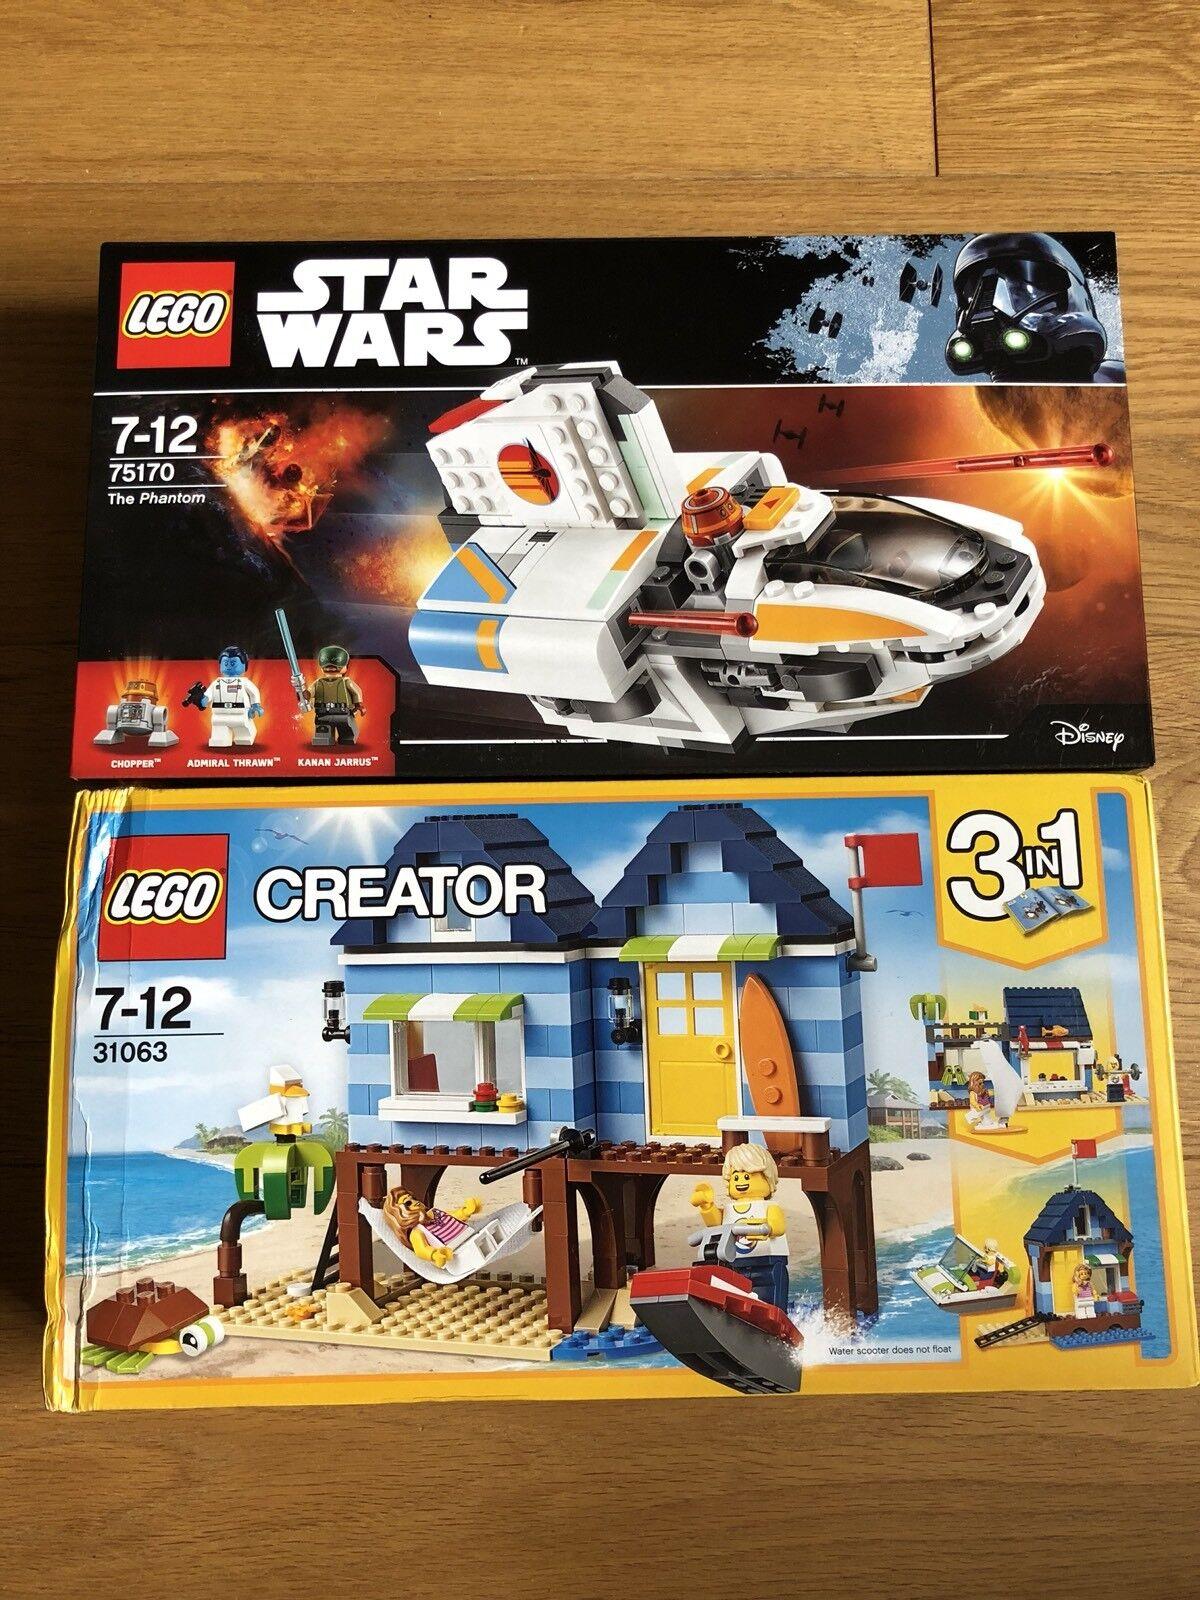 NEW Lego 2-Pack Bundle Star Wars 75170 & Creator 3in1 31063 Sets SEALED